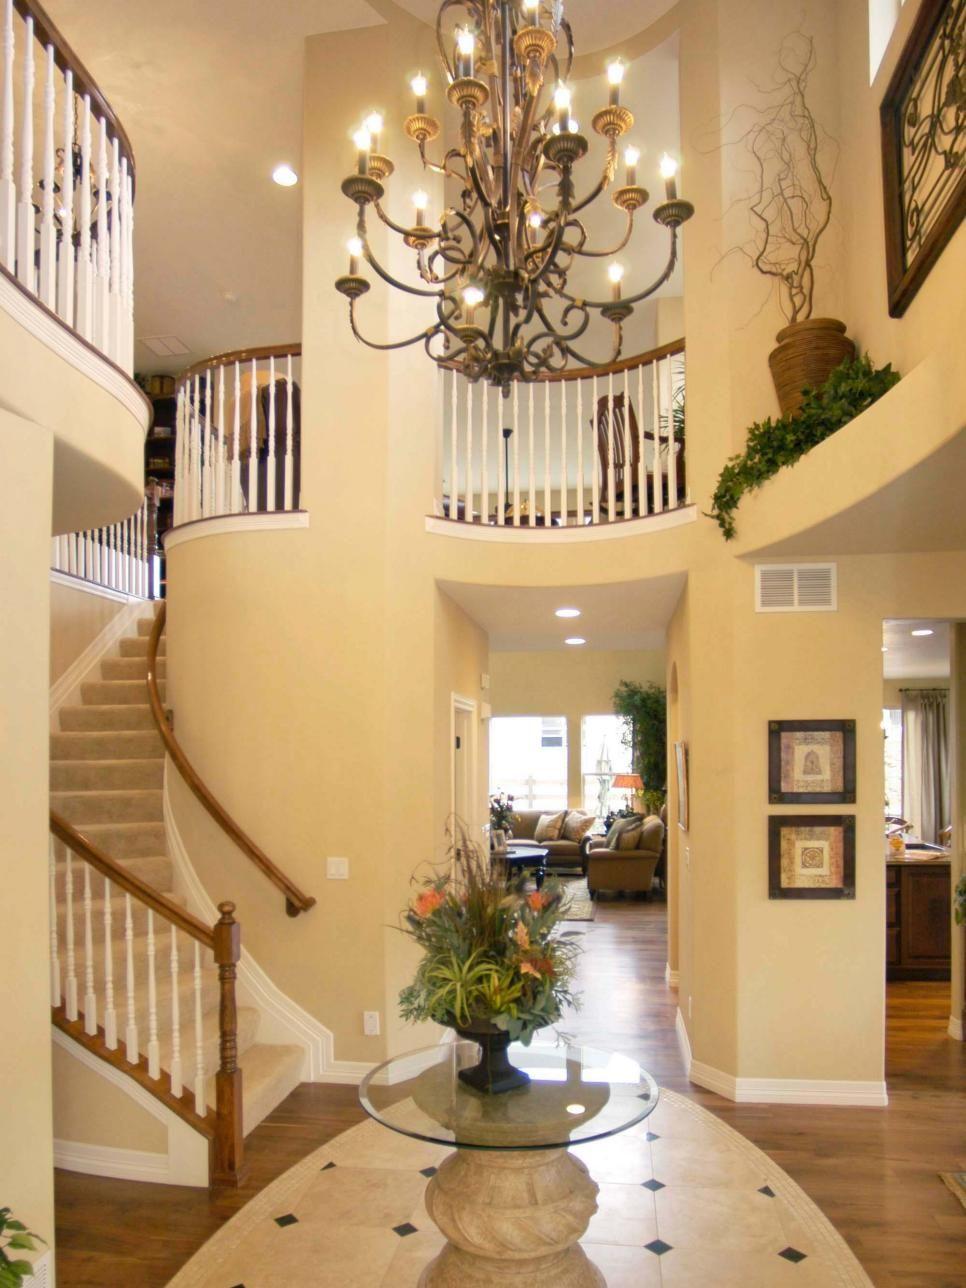 Entryway Lighting Designs | Hgtv, Foyers and Entry foyer